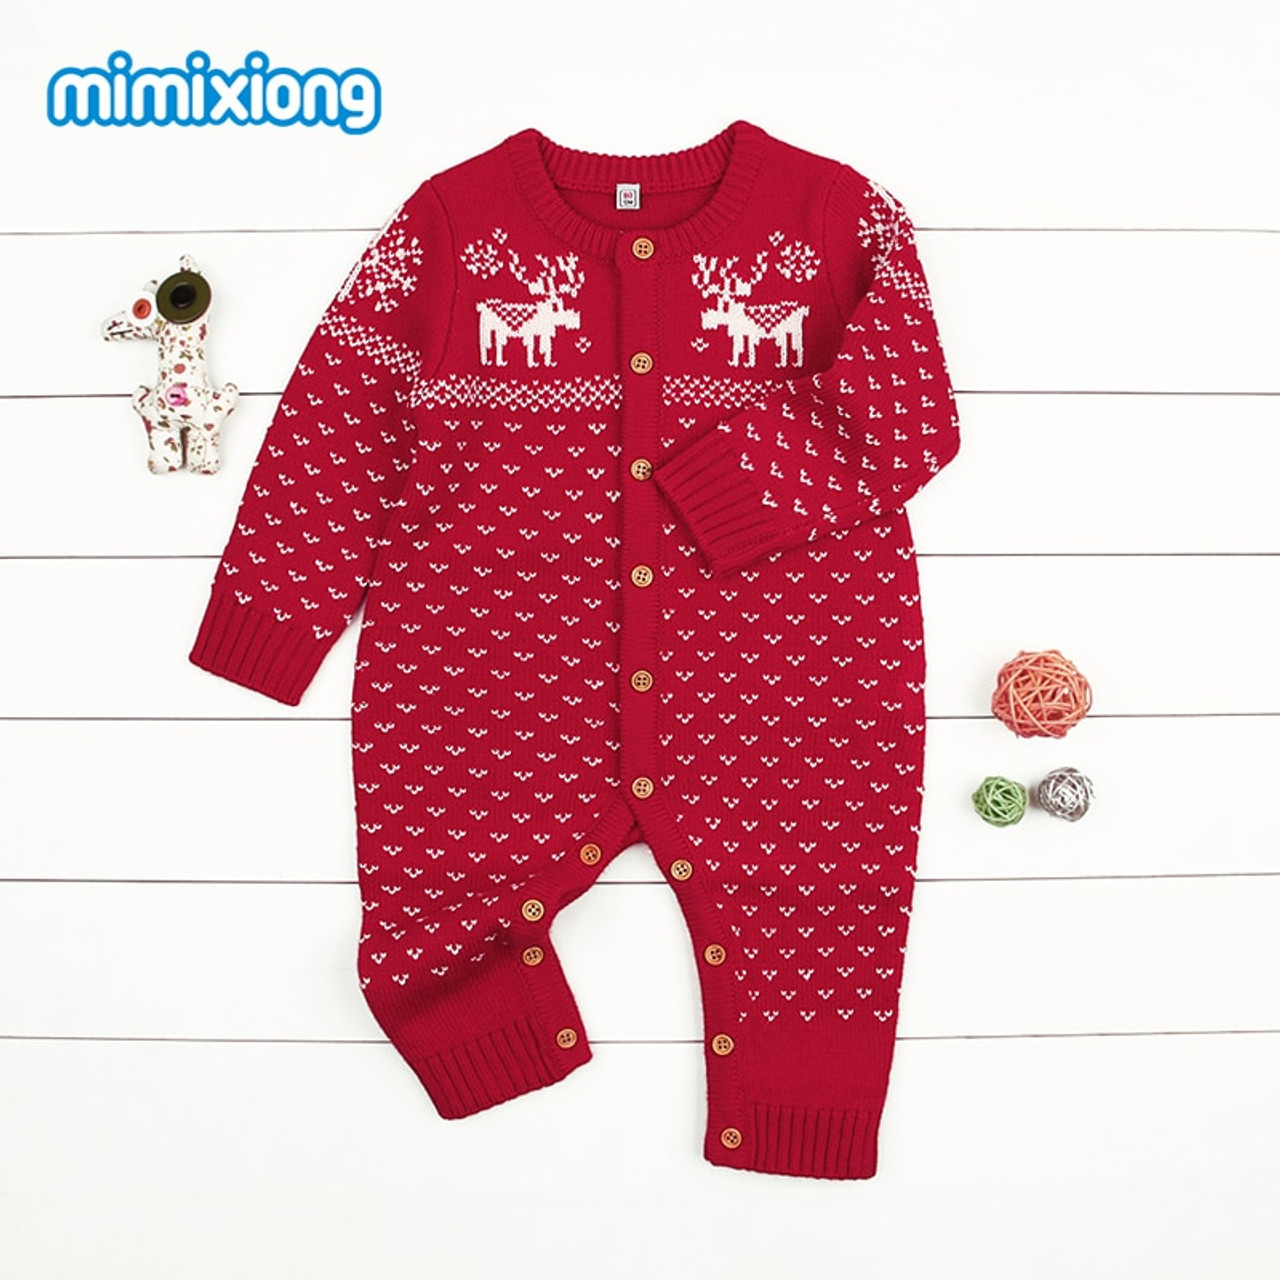 d6e34da81403 ... Christmas Reindeer Knitted Newborn Baby Boys Girls Romper Jumpsuit  Winter Kids Costume Long Sleeve Pajamas Overalls ...